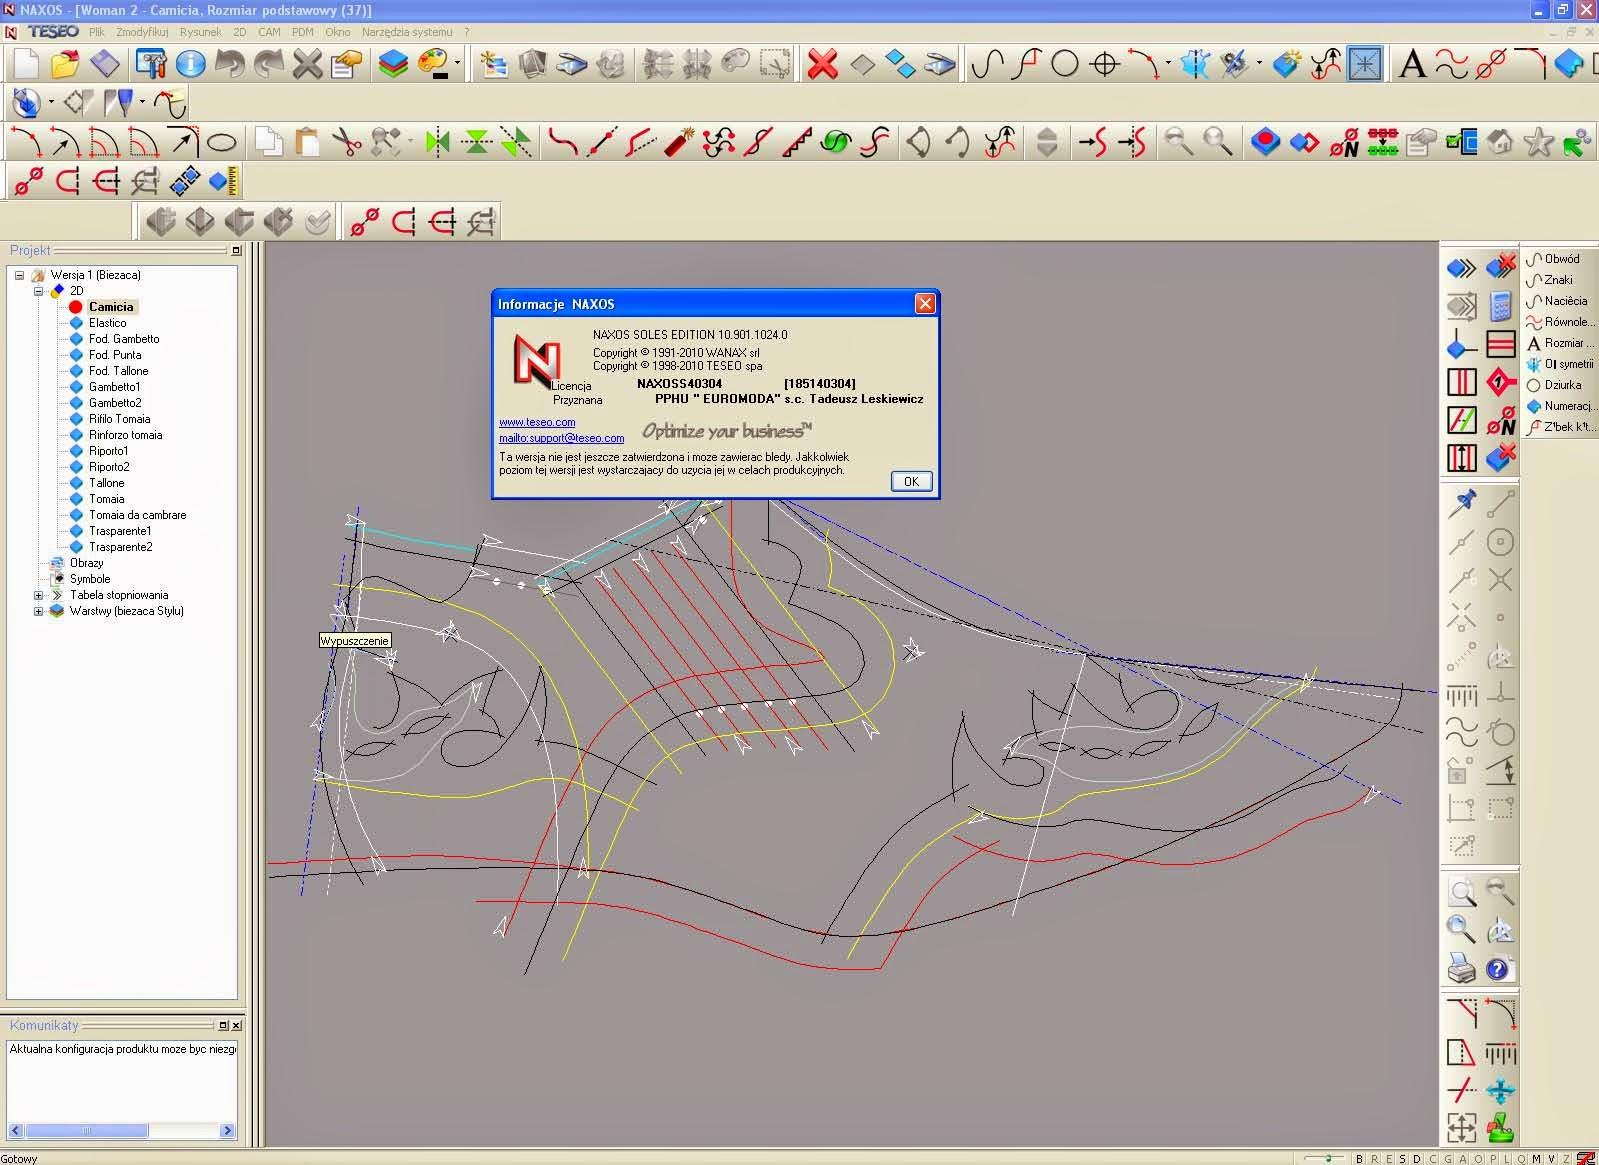 eutron smartkey 3 driver windows 7 64 bit